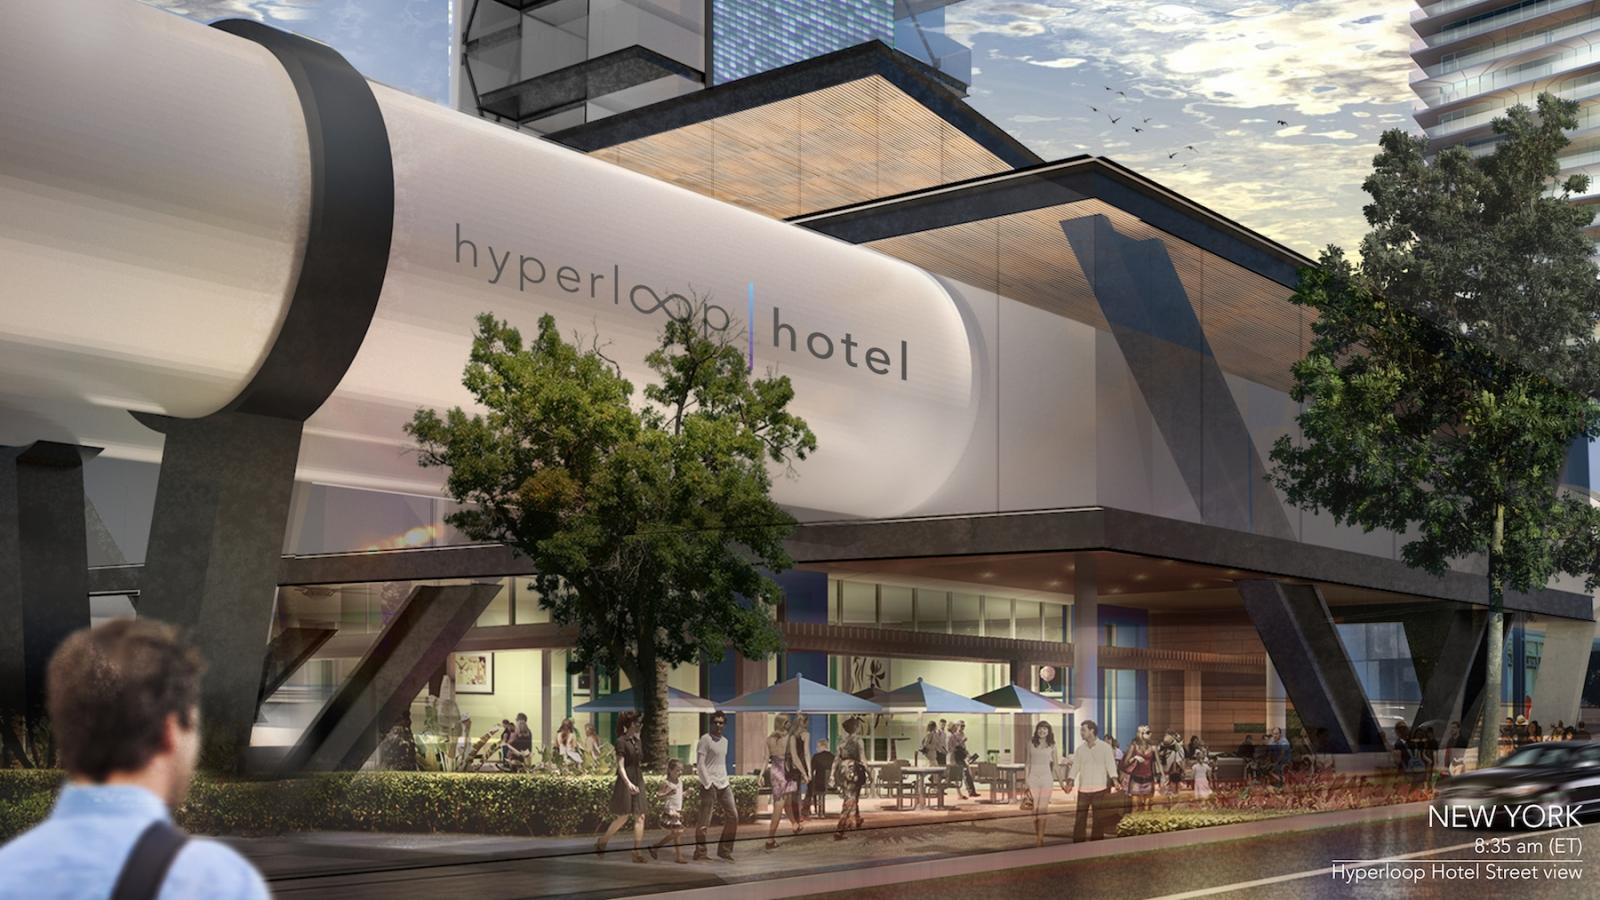 Conceptual image of Hyperloop Hotel